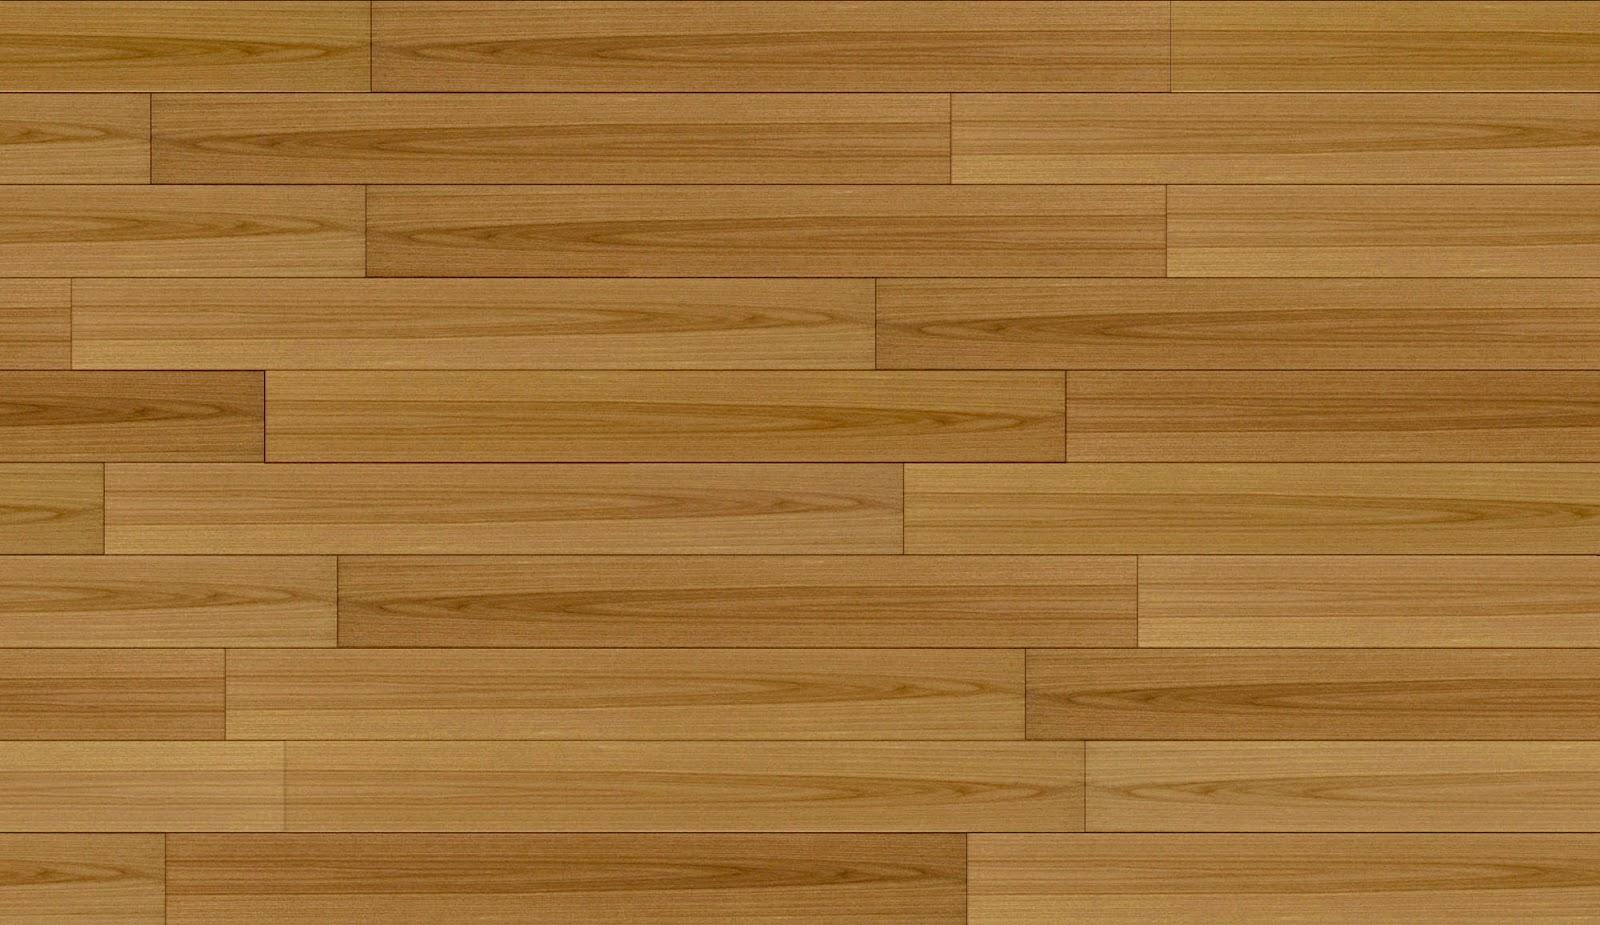 Sketchup Texture Texture Wood Wood Floors Parquet Bambu